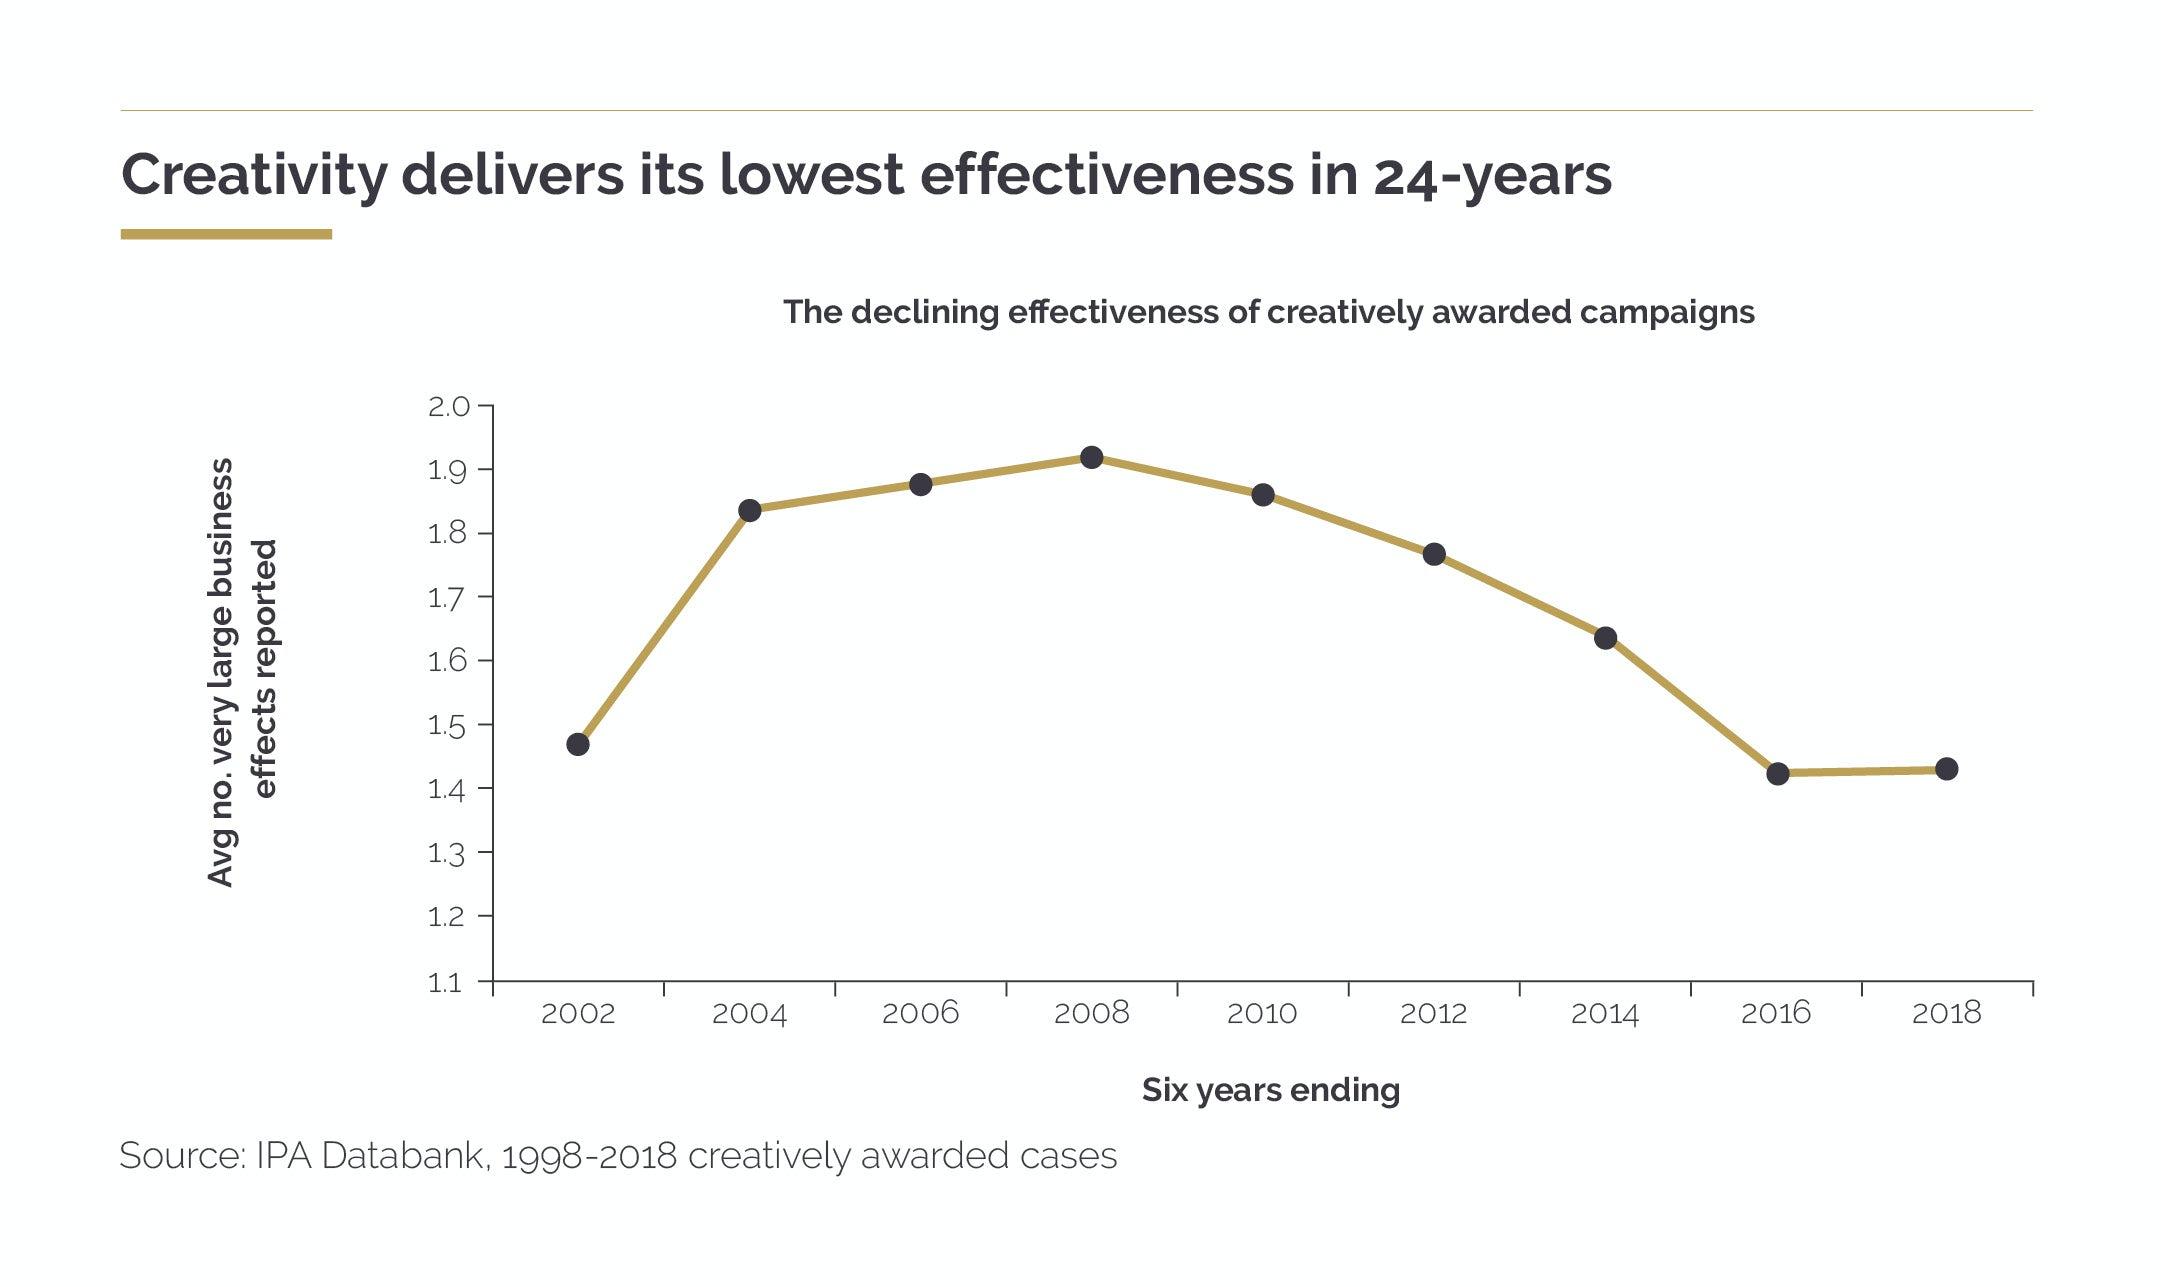 Crisis in creative effectiveness